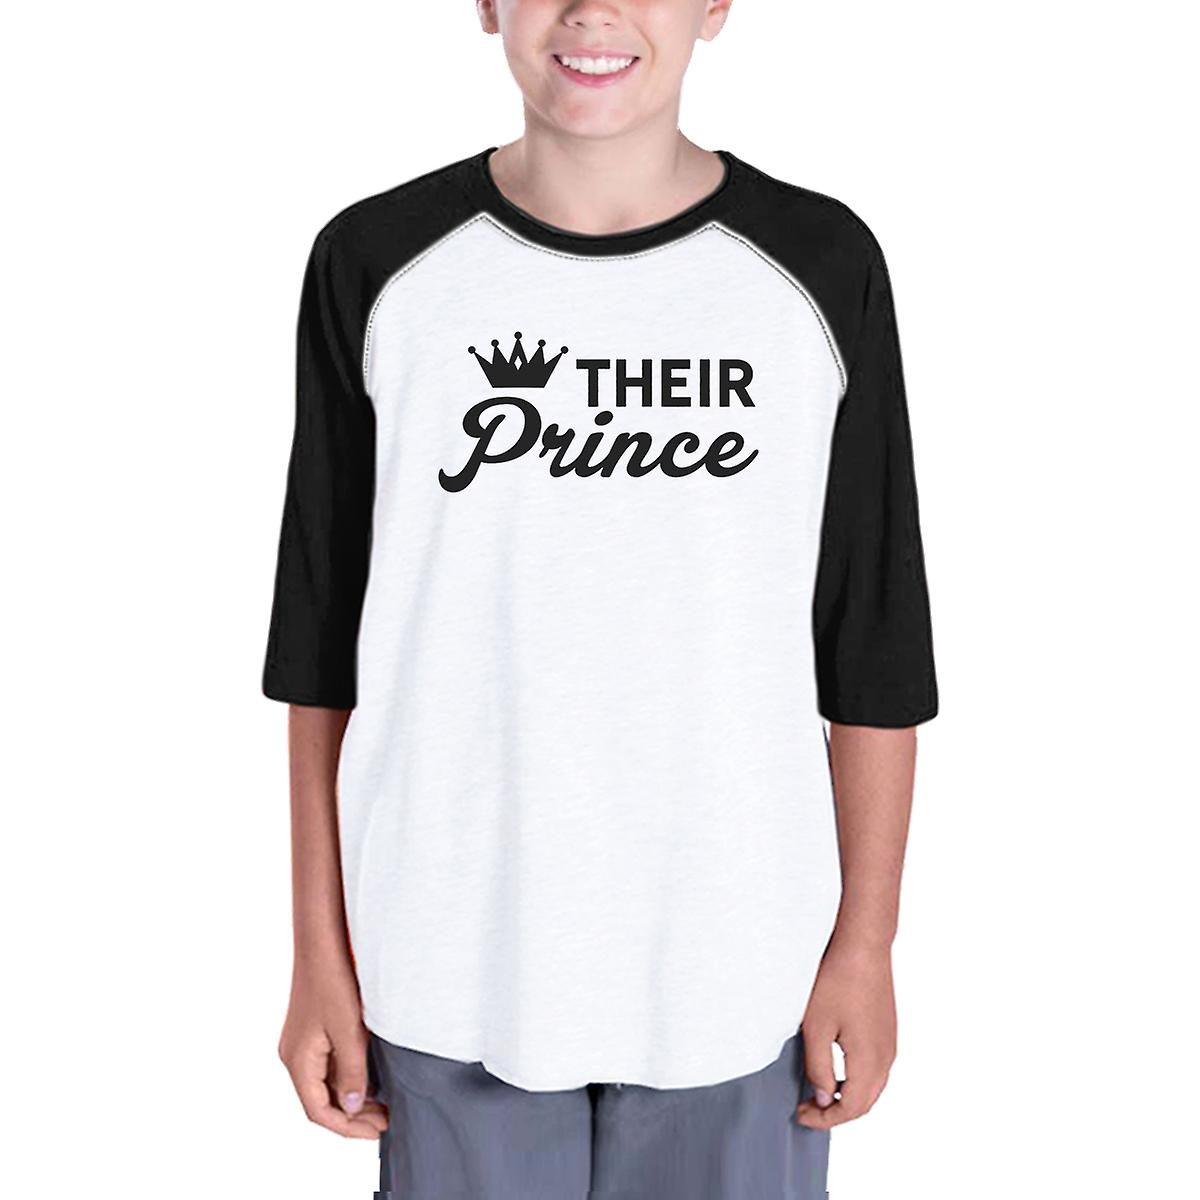 Their Prince Kid Baseball Tee For Boys Black Sleeve Raglan For Boys